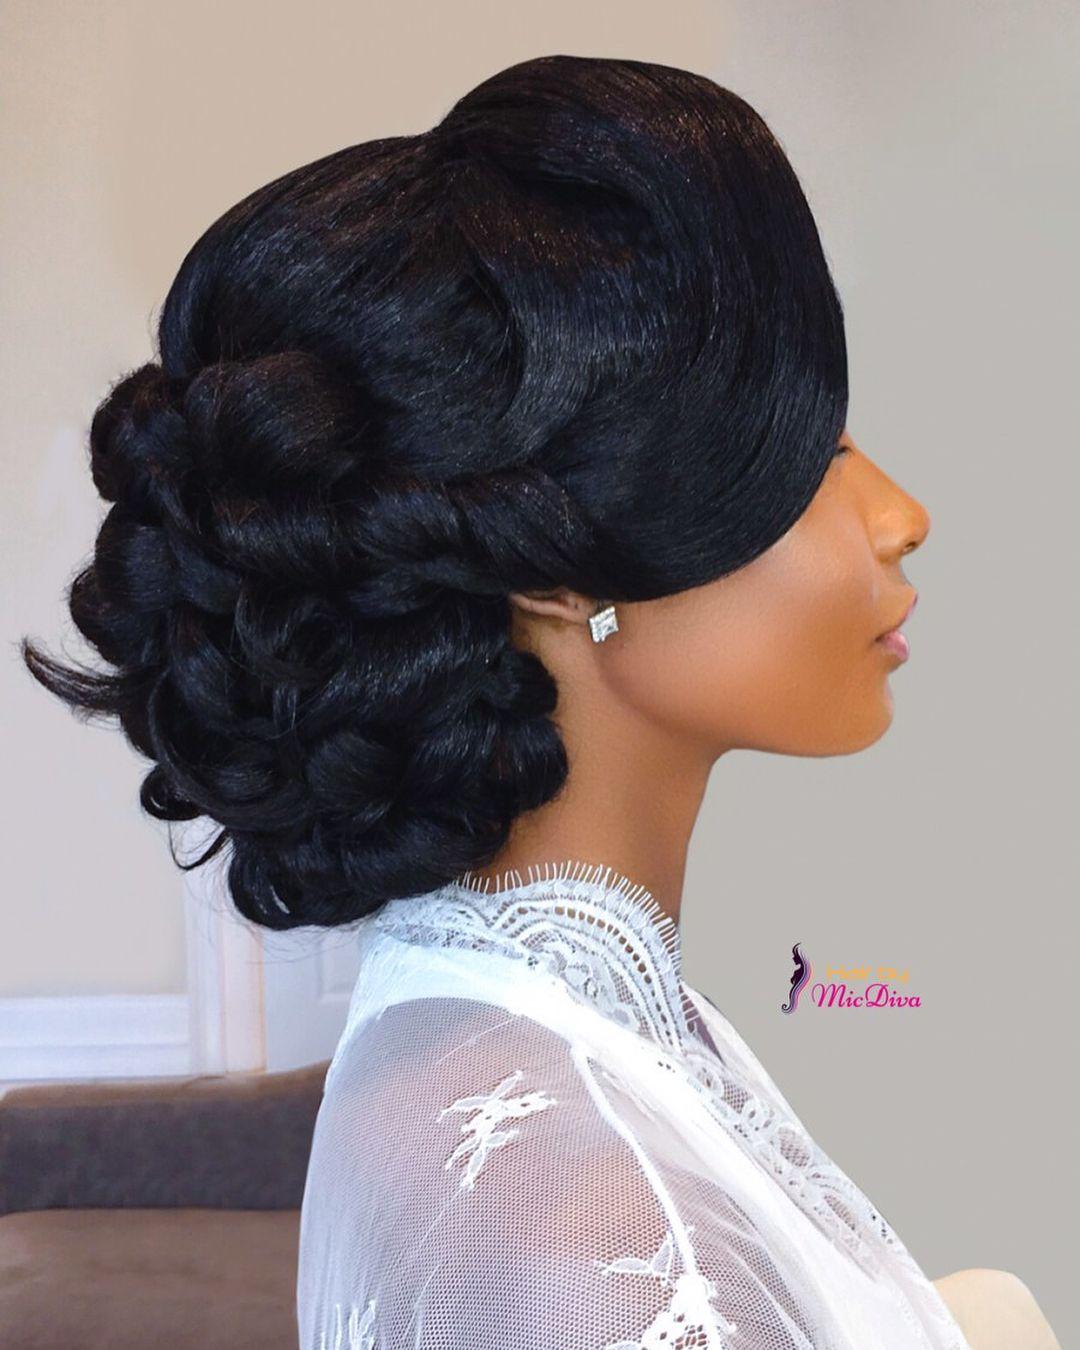 Dmv Bridal Hairstylist On Instagram Views Bride Requested Hairbymicdiva Signa Black Bridesmaids Hairstyles Black Wedding Hairstyles Natural Hair Bride